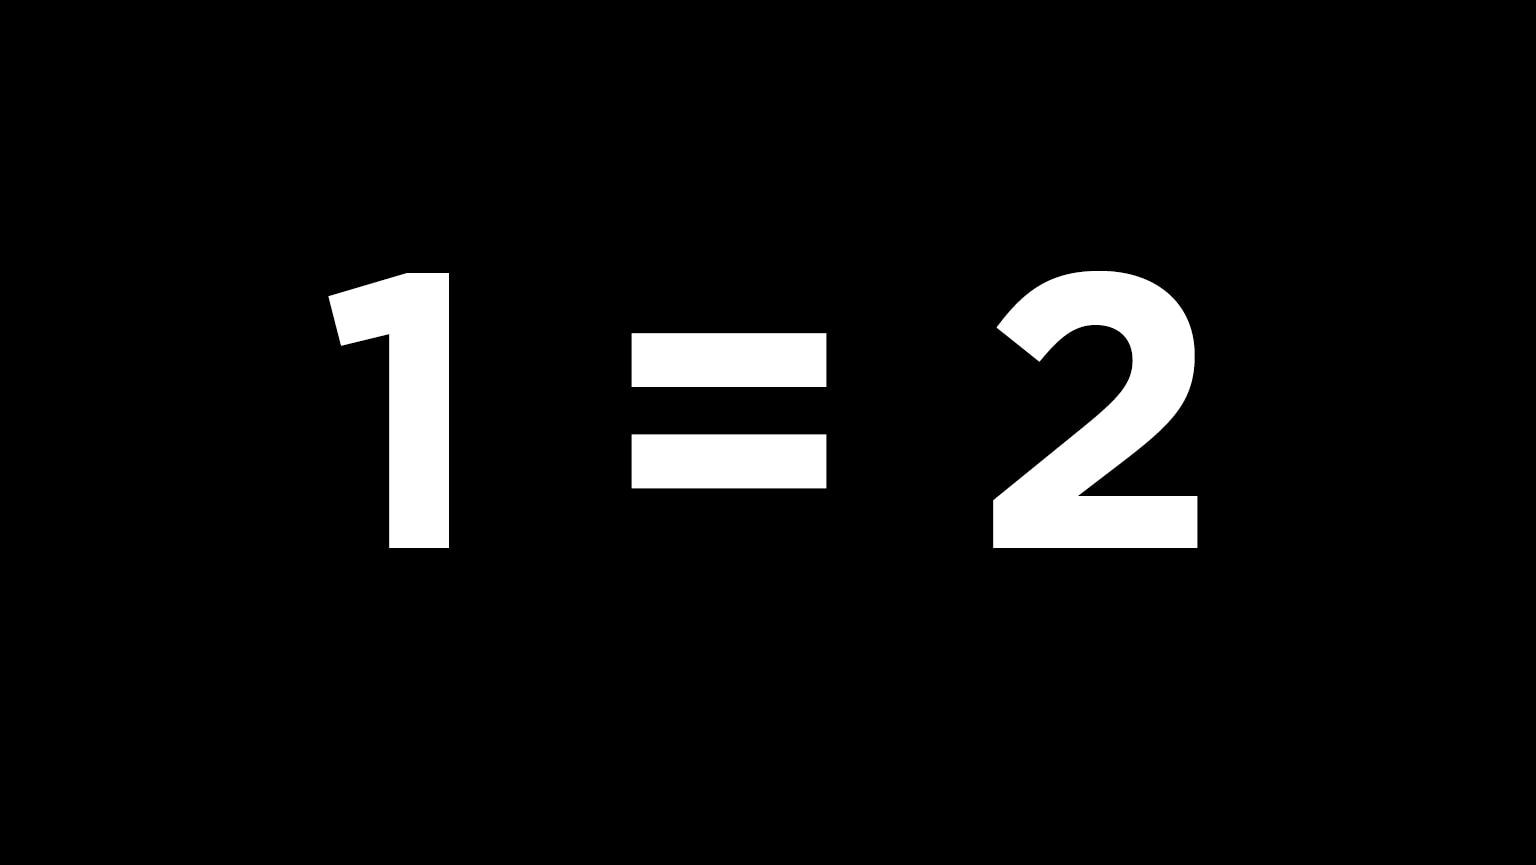 When 1 = 2—False Proofs